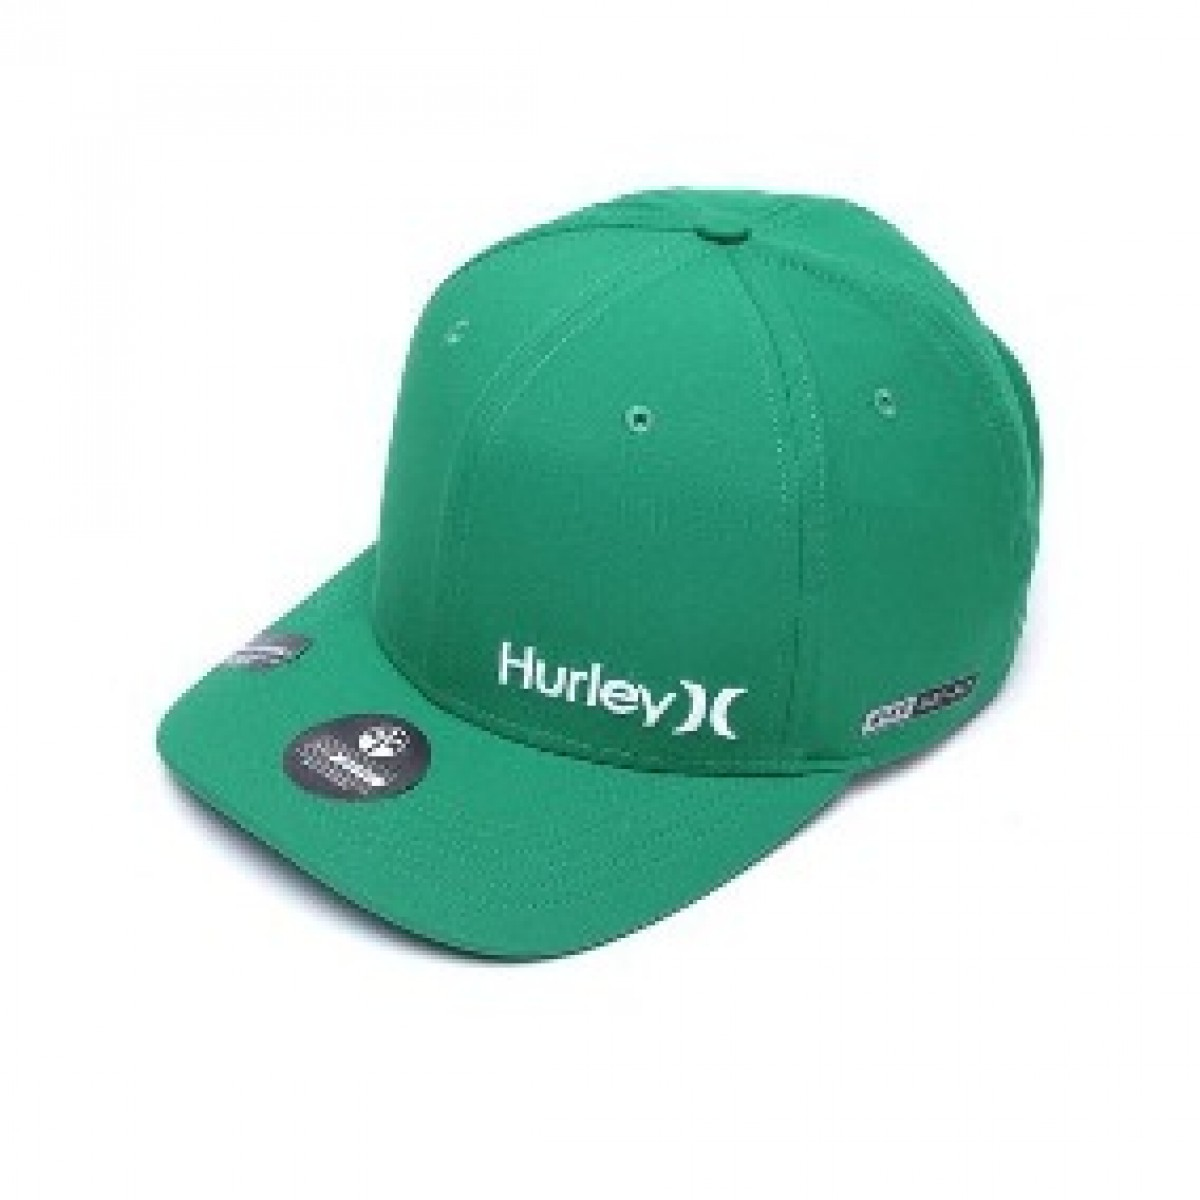 7482931920cd5 Boné Masculino Hurley Dri Fit Verde - Compre Agora